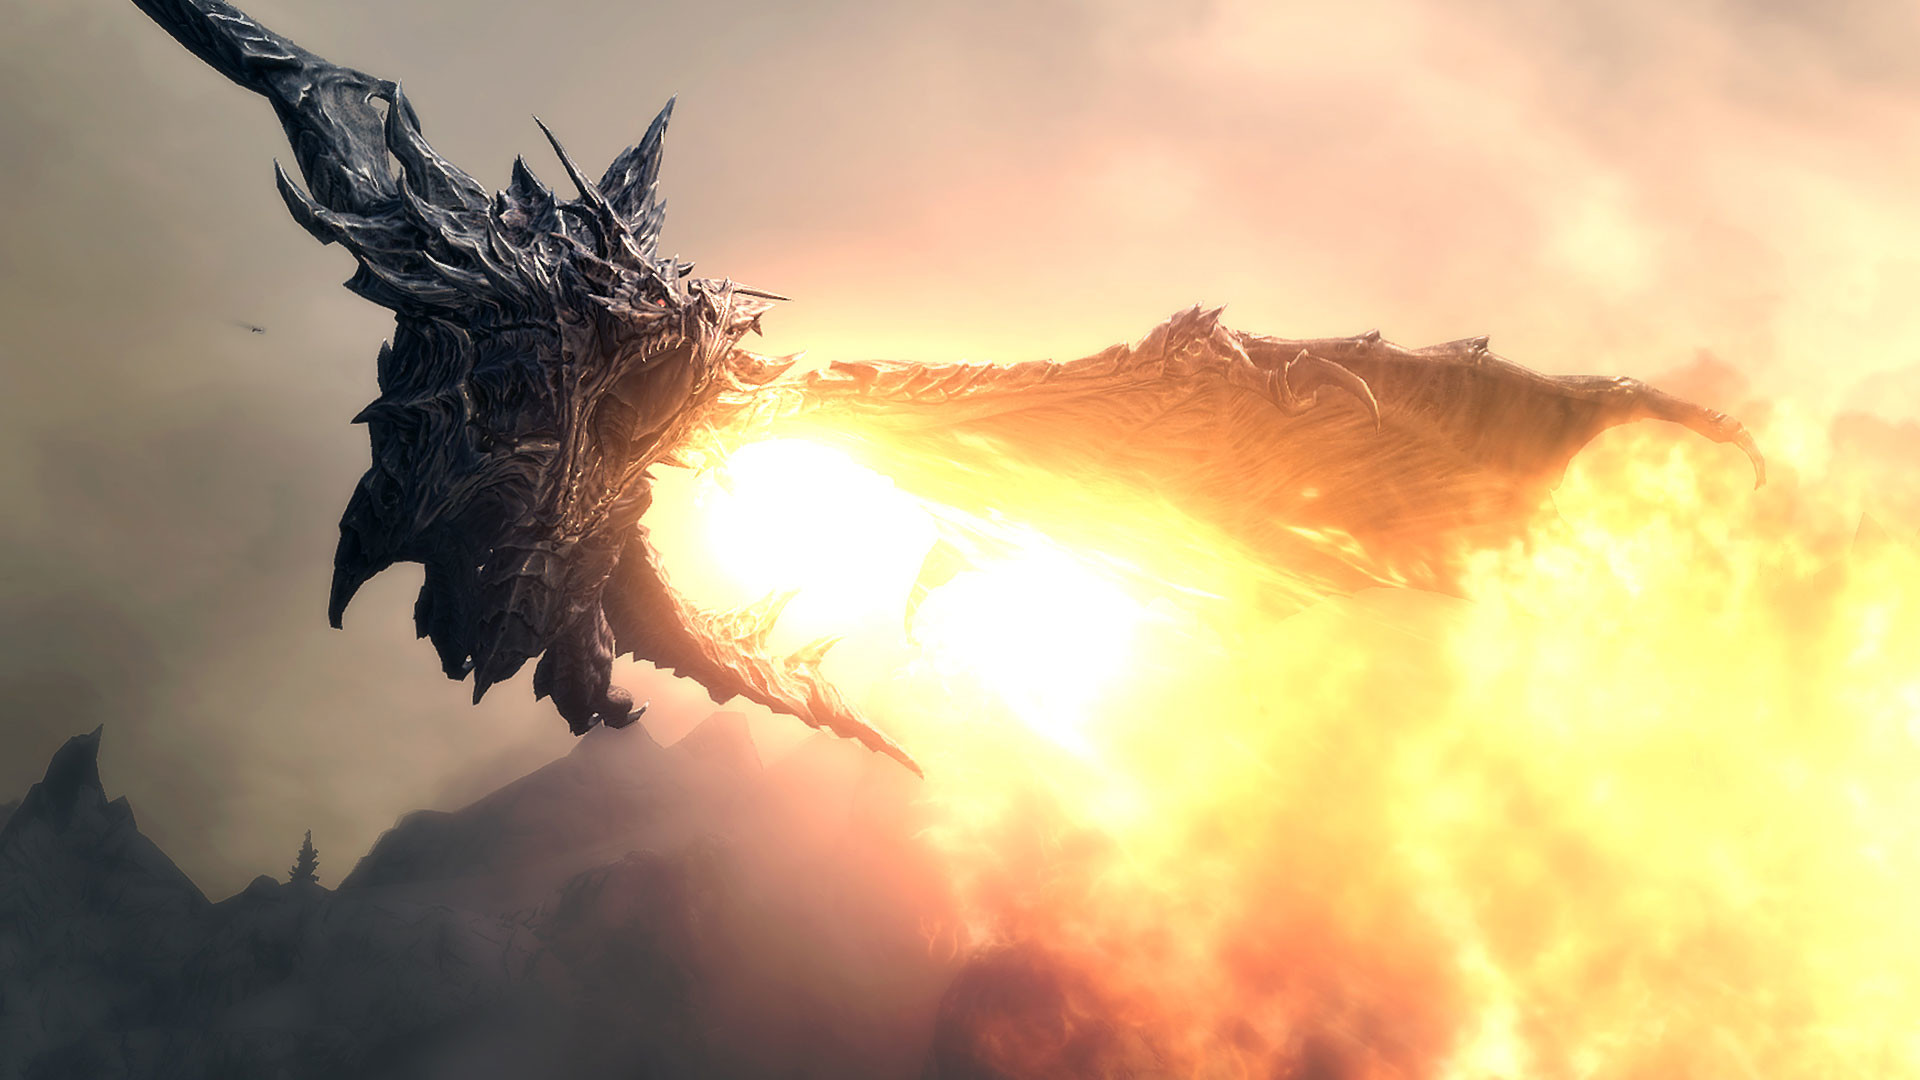 sunset skyrim dragon image